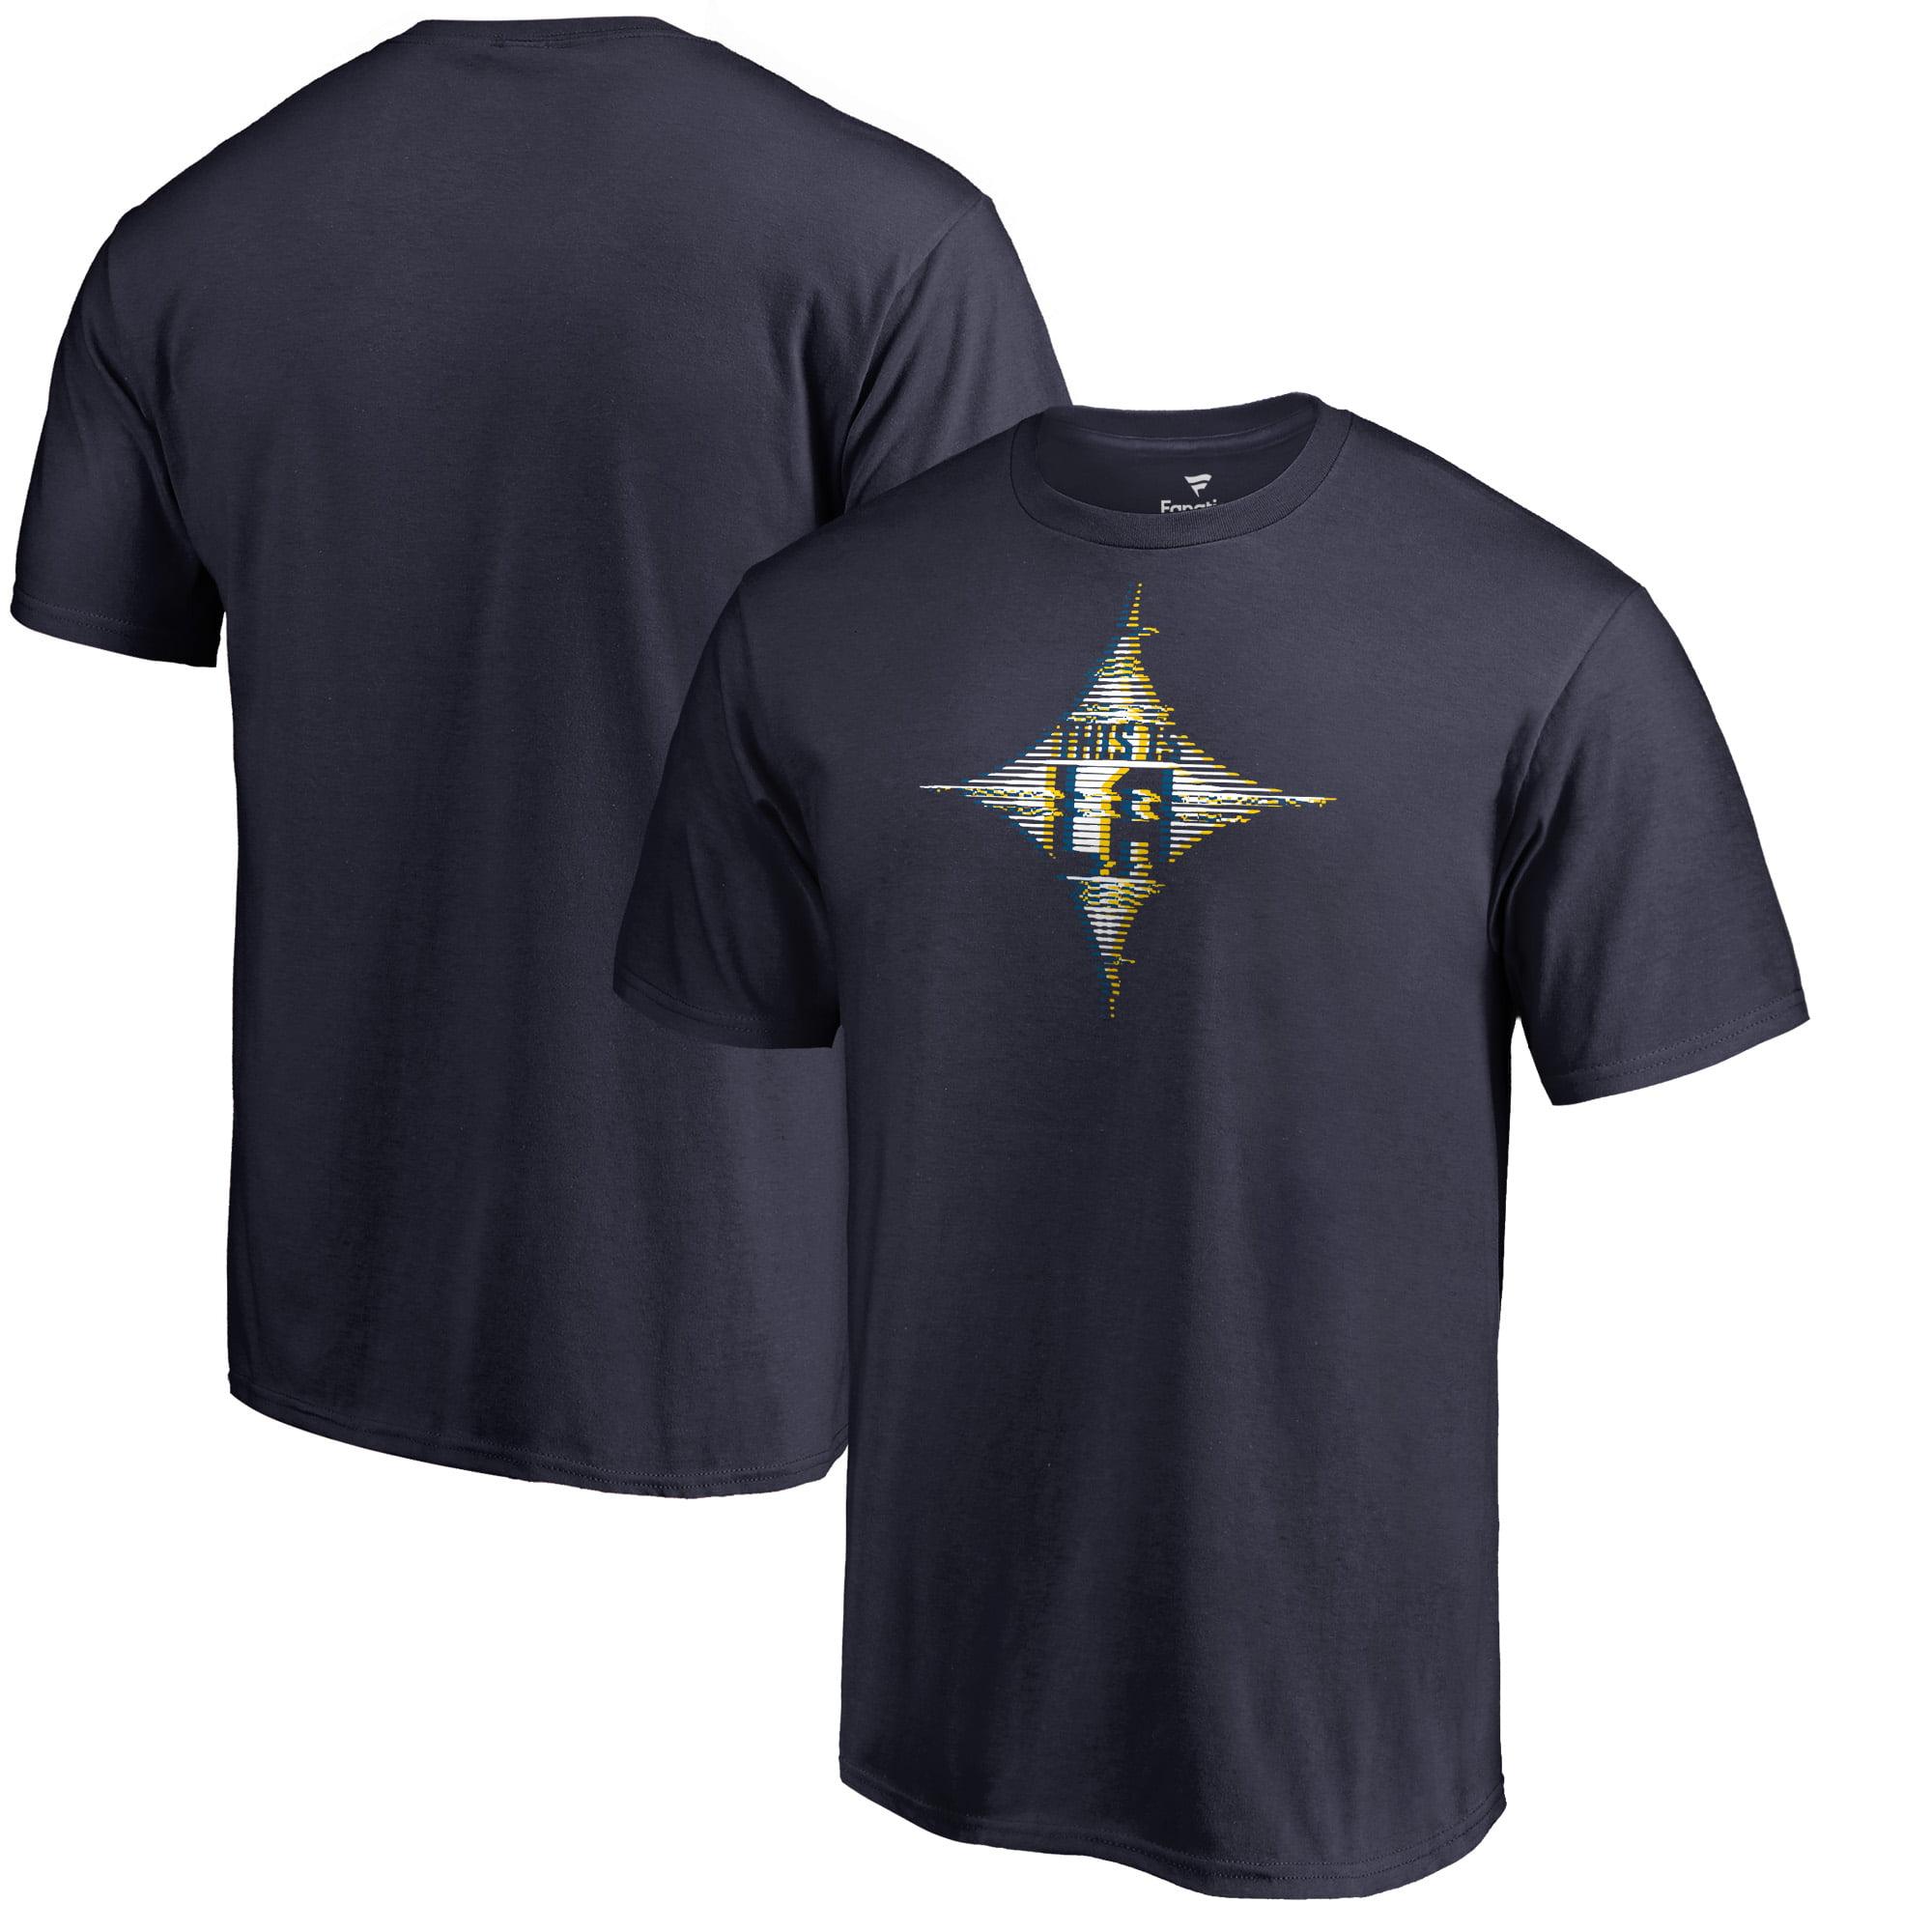 LA Galaxy Fanatics Branded League Trend Alternate T-Shirt - Navy